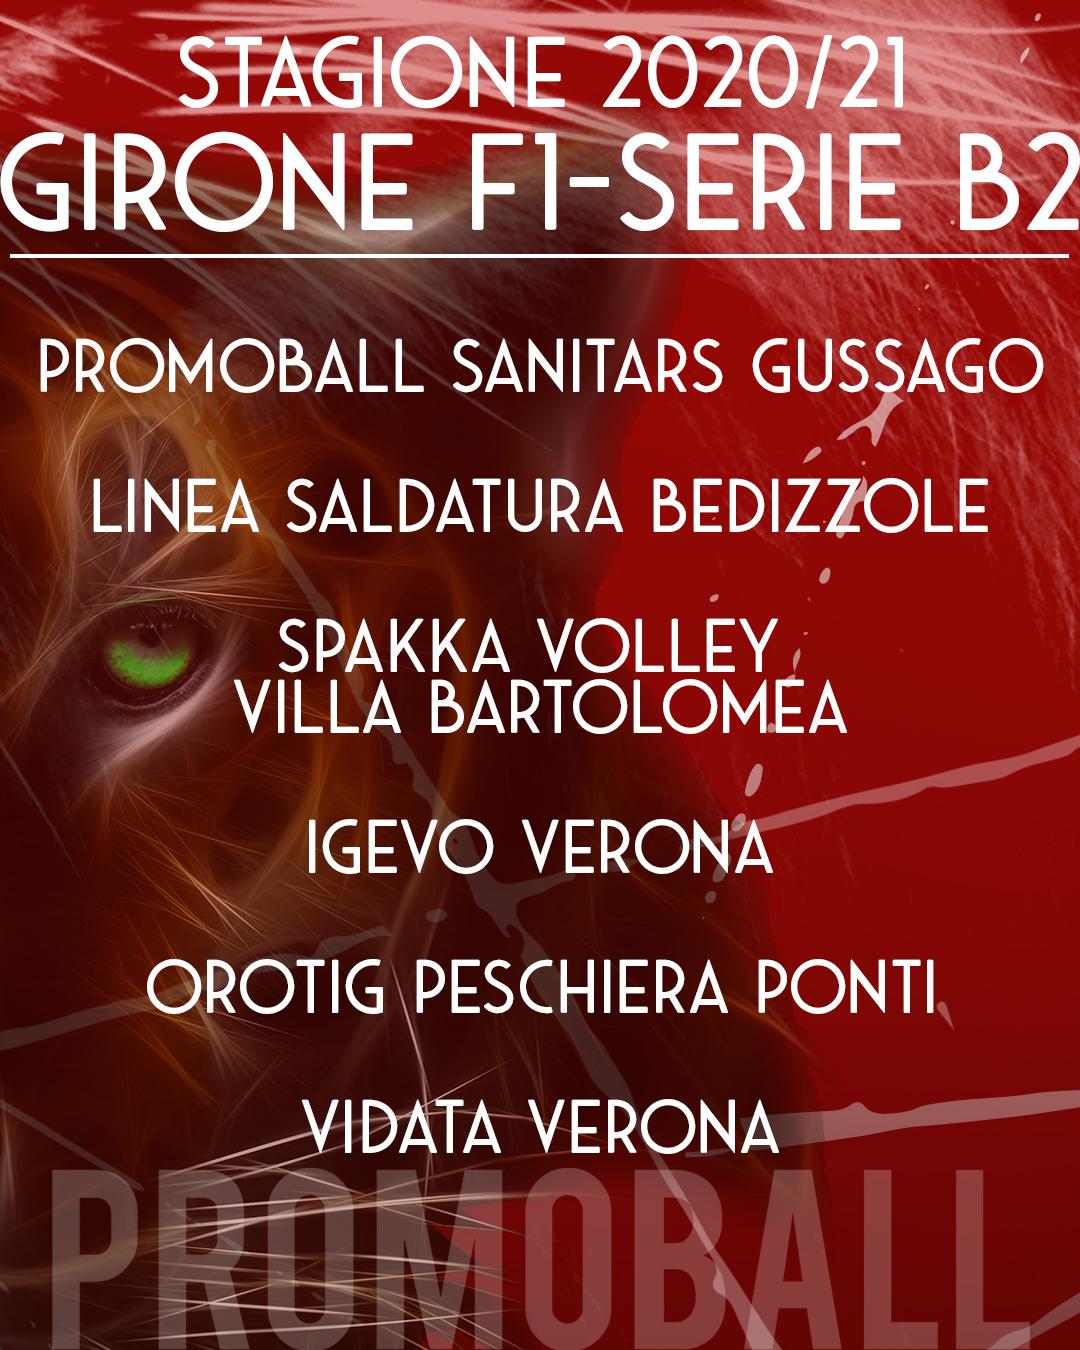 Girone F1 Serie B2 Promoball